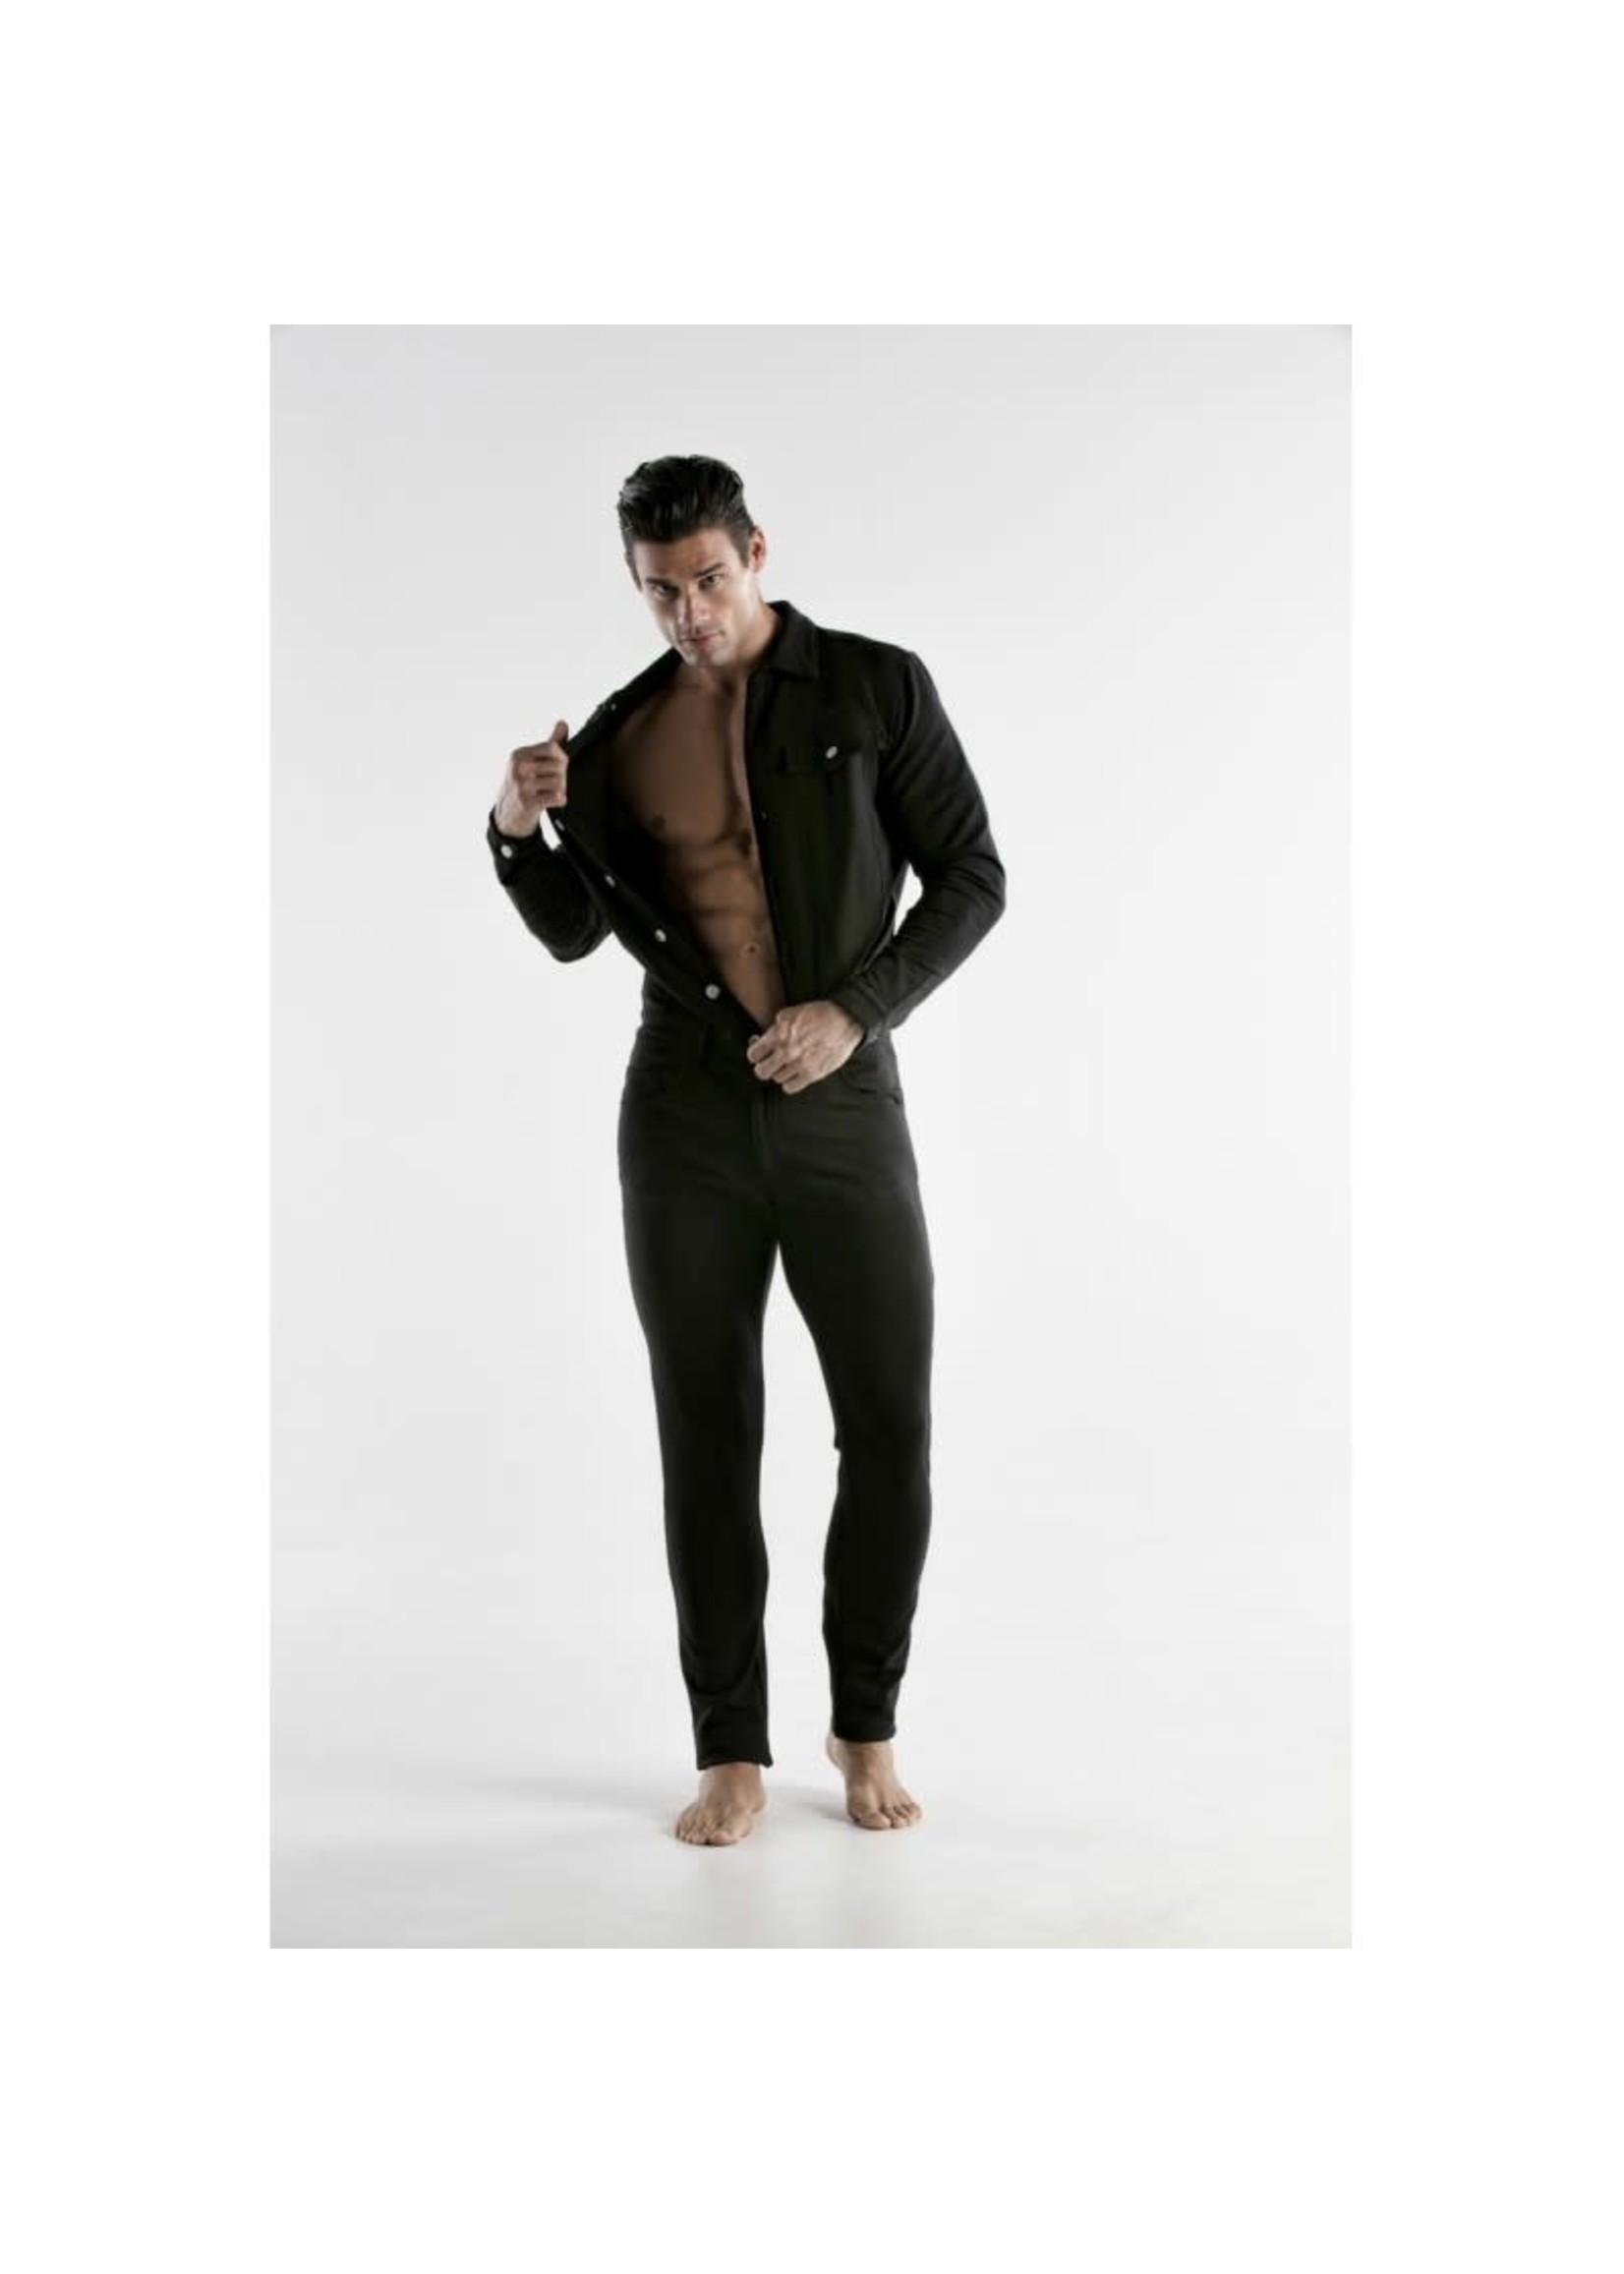 665 Leather Code 22 Jumpsuit